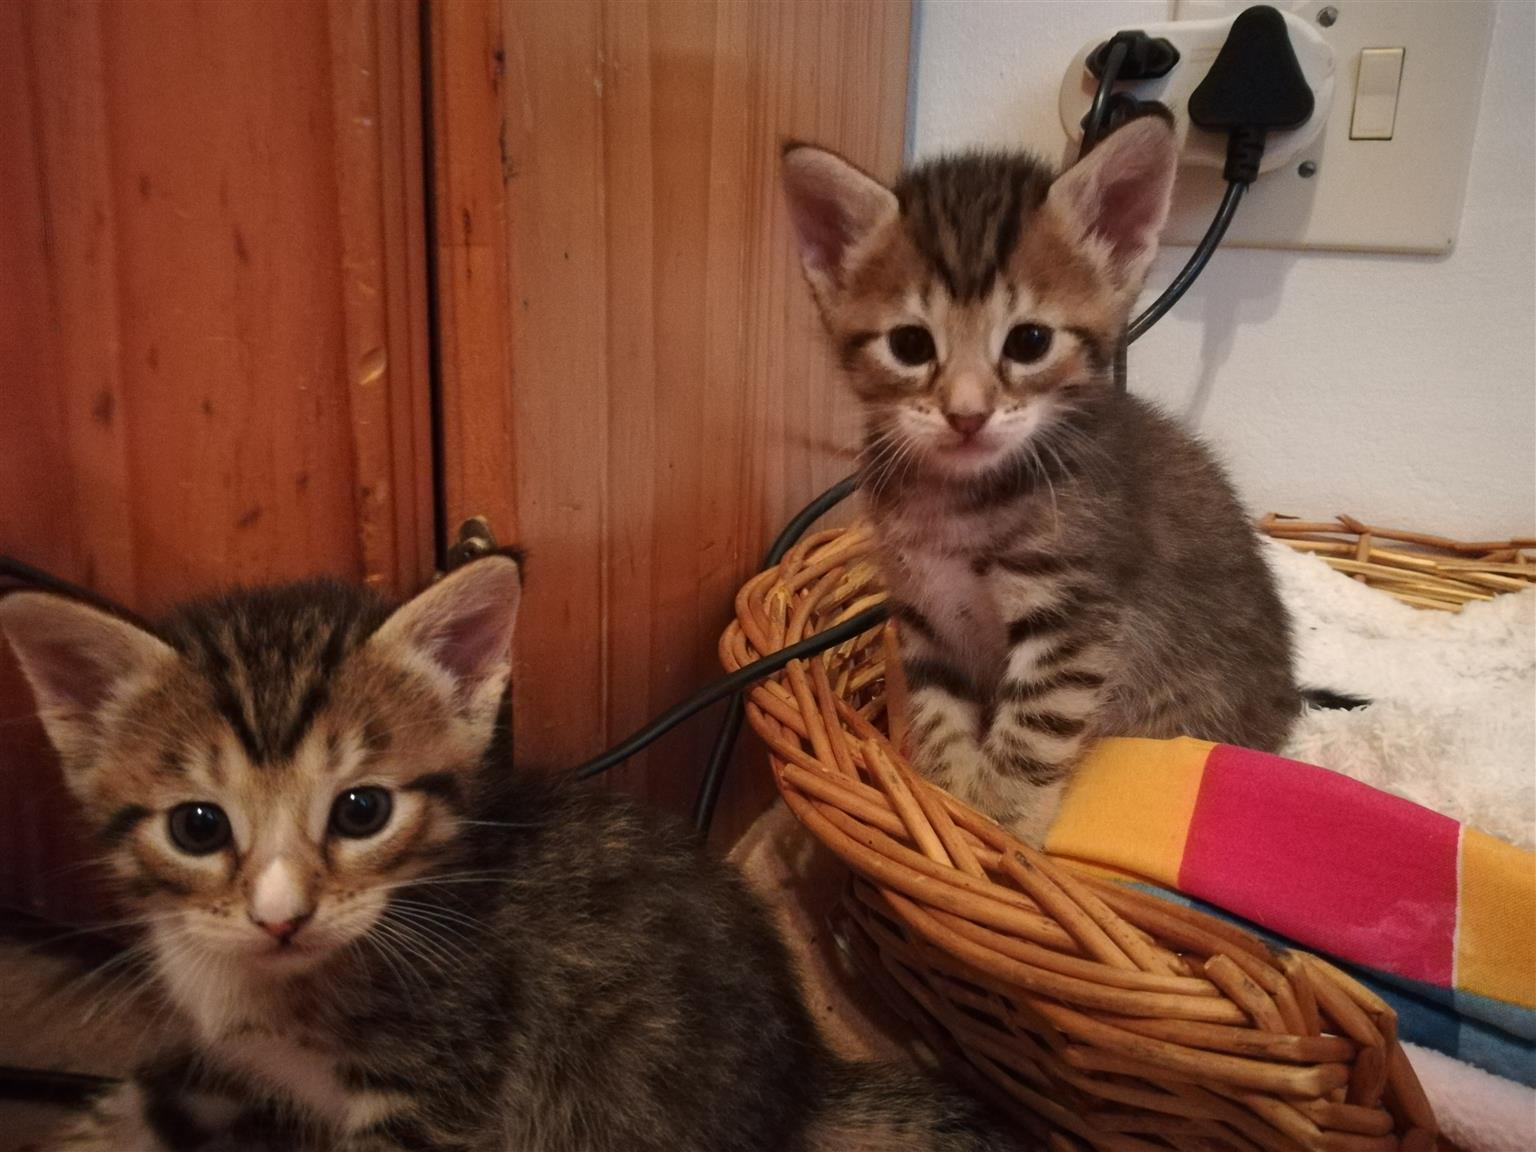 Plaful kittens